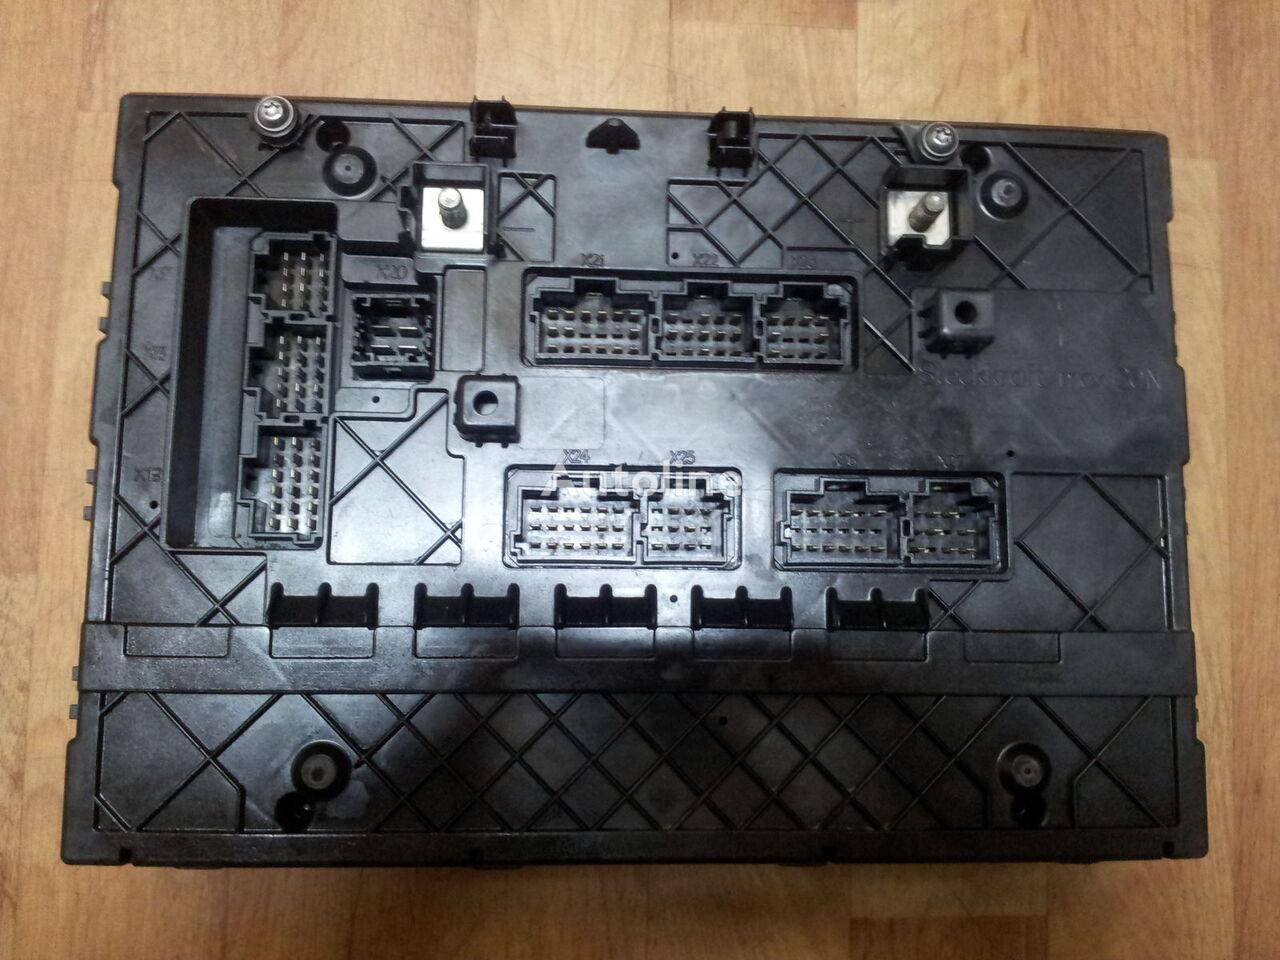 Actros Gm Fuse Box Detailed Schematics Diagram Panel Mercedes Benz Mp4 Euro6 Grundmodul Relay Sam Chrysler